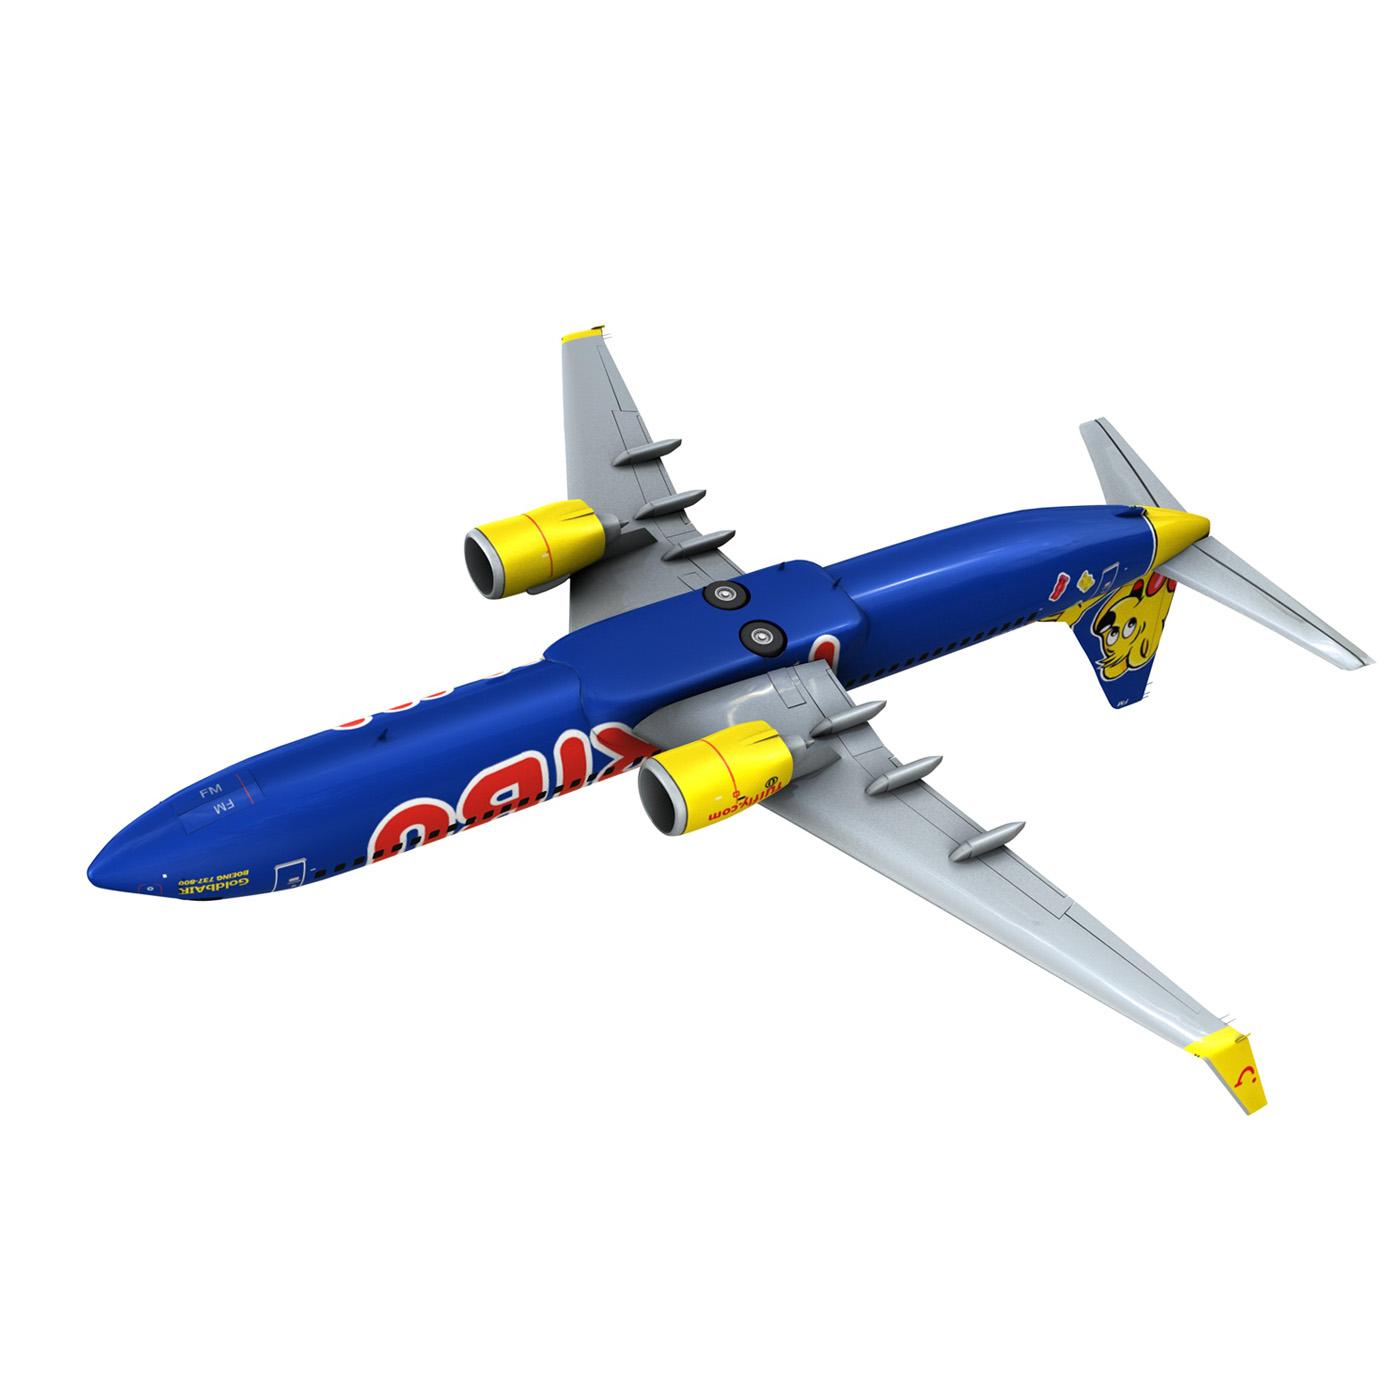 boeing 737-800 goldbair 3d model 3ds fbx c4d lwo obj 293506